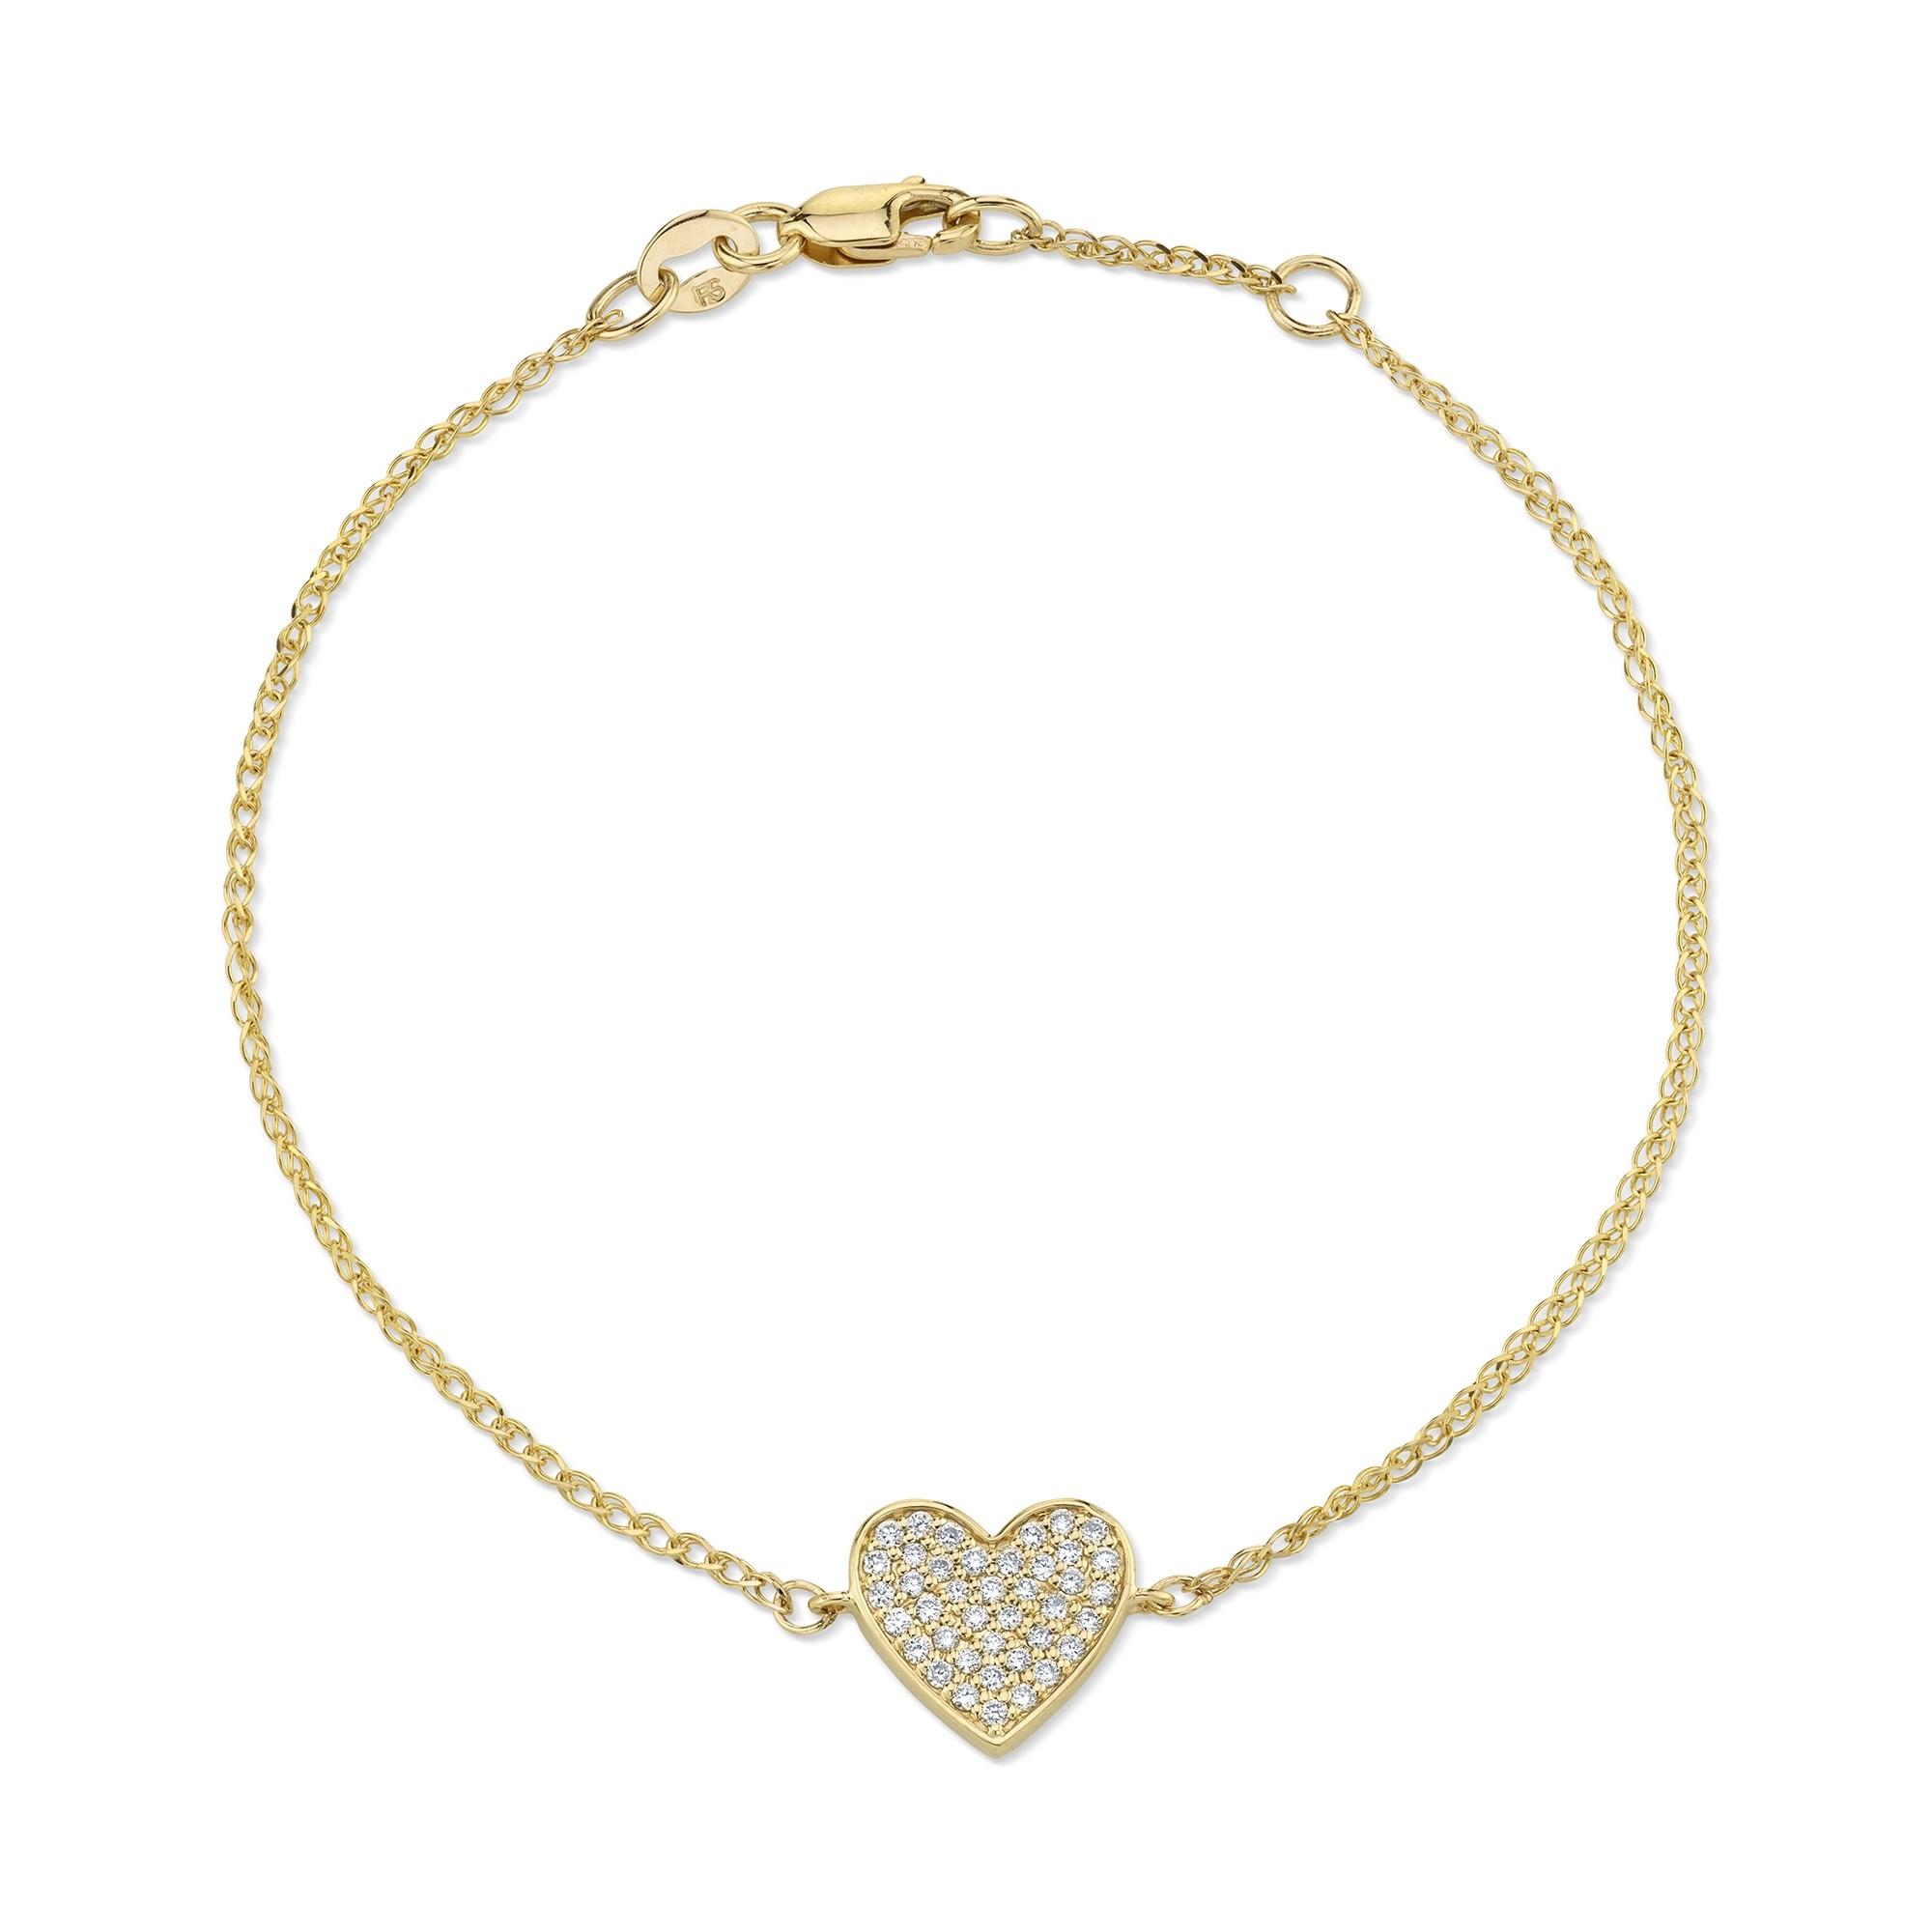 14k Yellow Gold Diamond Floating Heart Bracelet